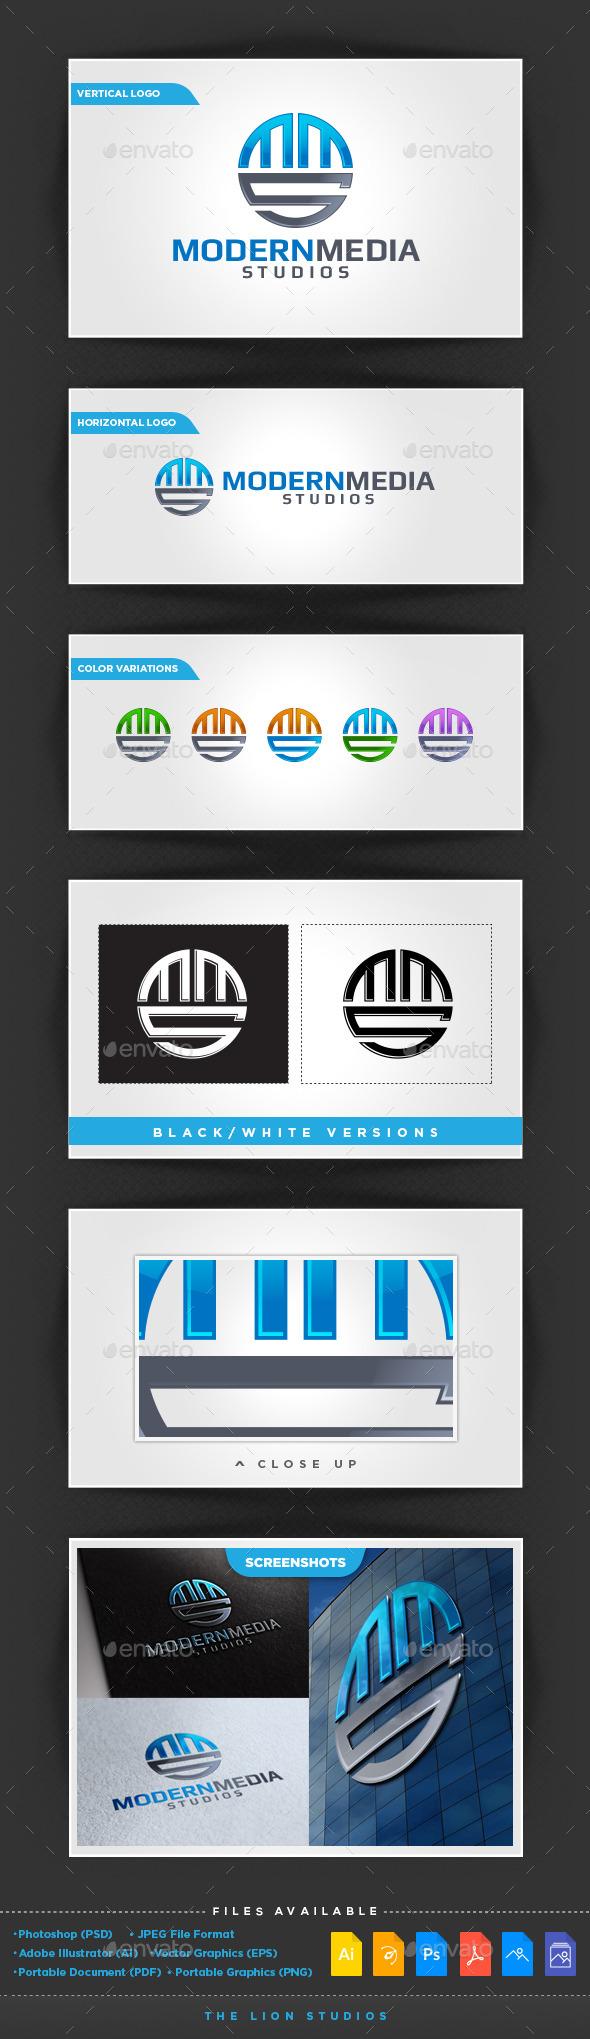 GraphicRiver ModernMedia Studios 10192941